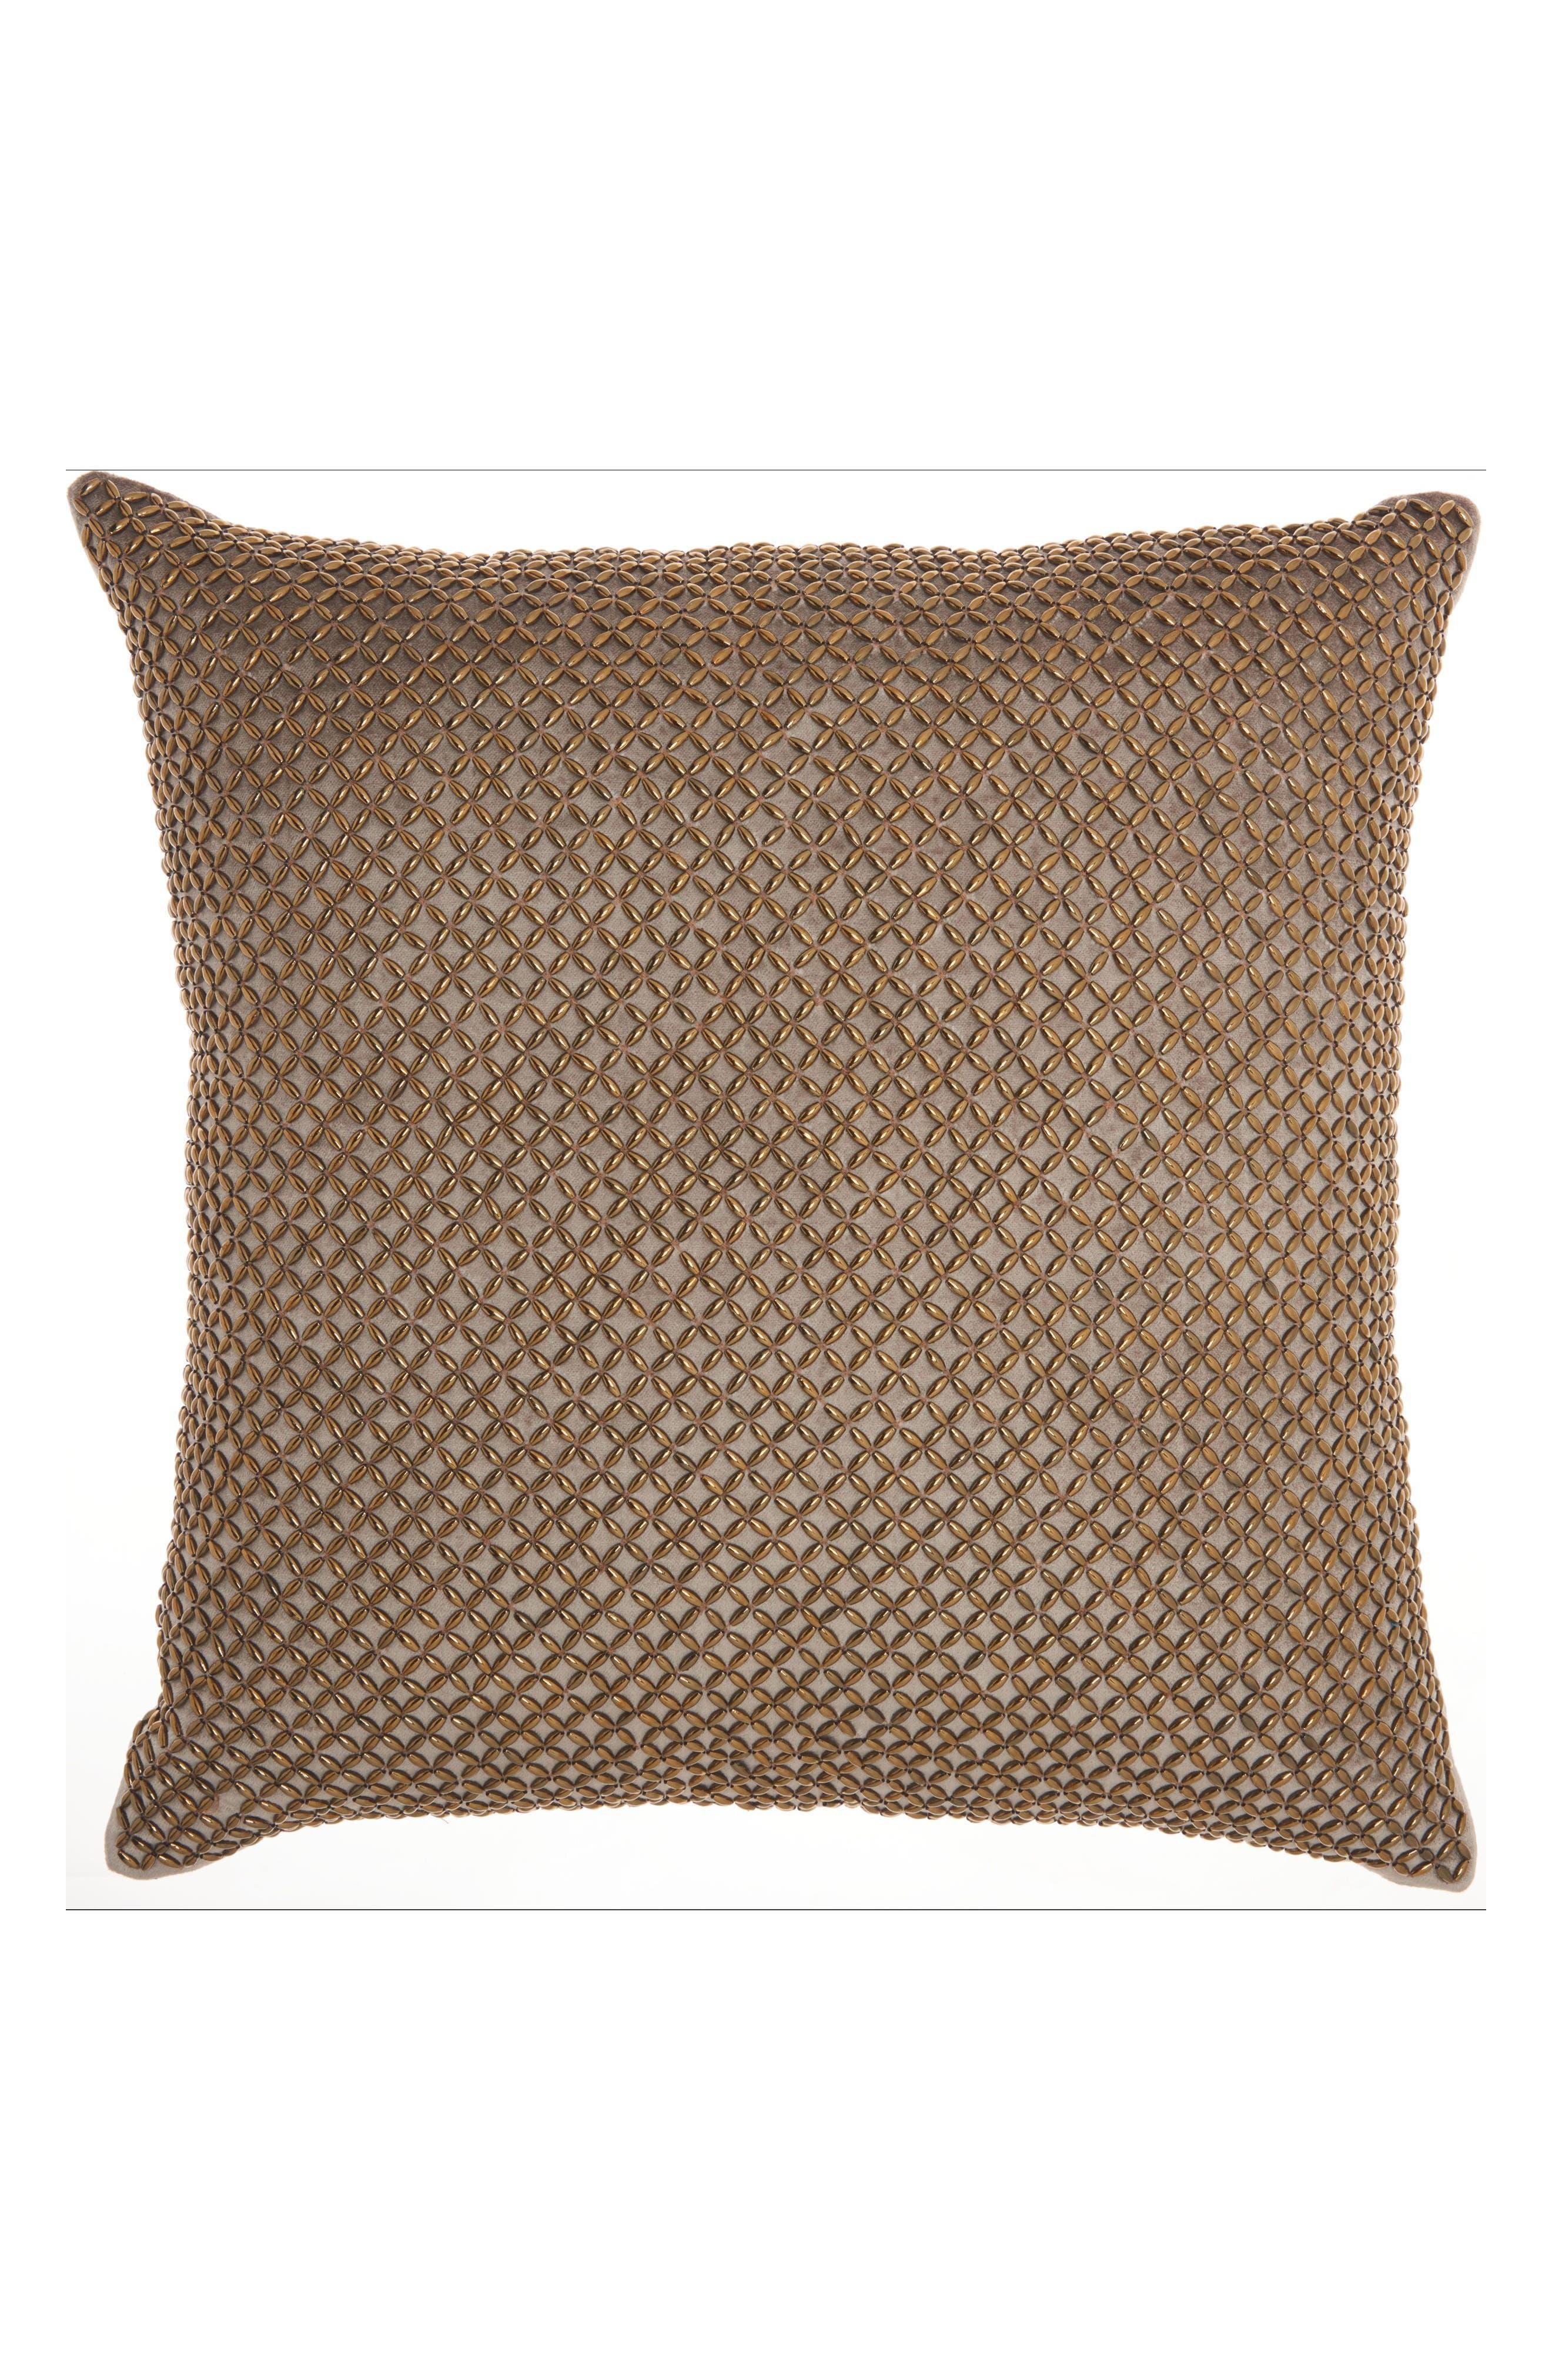 MINA VICTORY,                             Cobble Jewel Accent Pillow,                             Main thumbnail 1, color,                             280